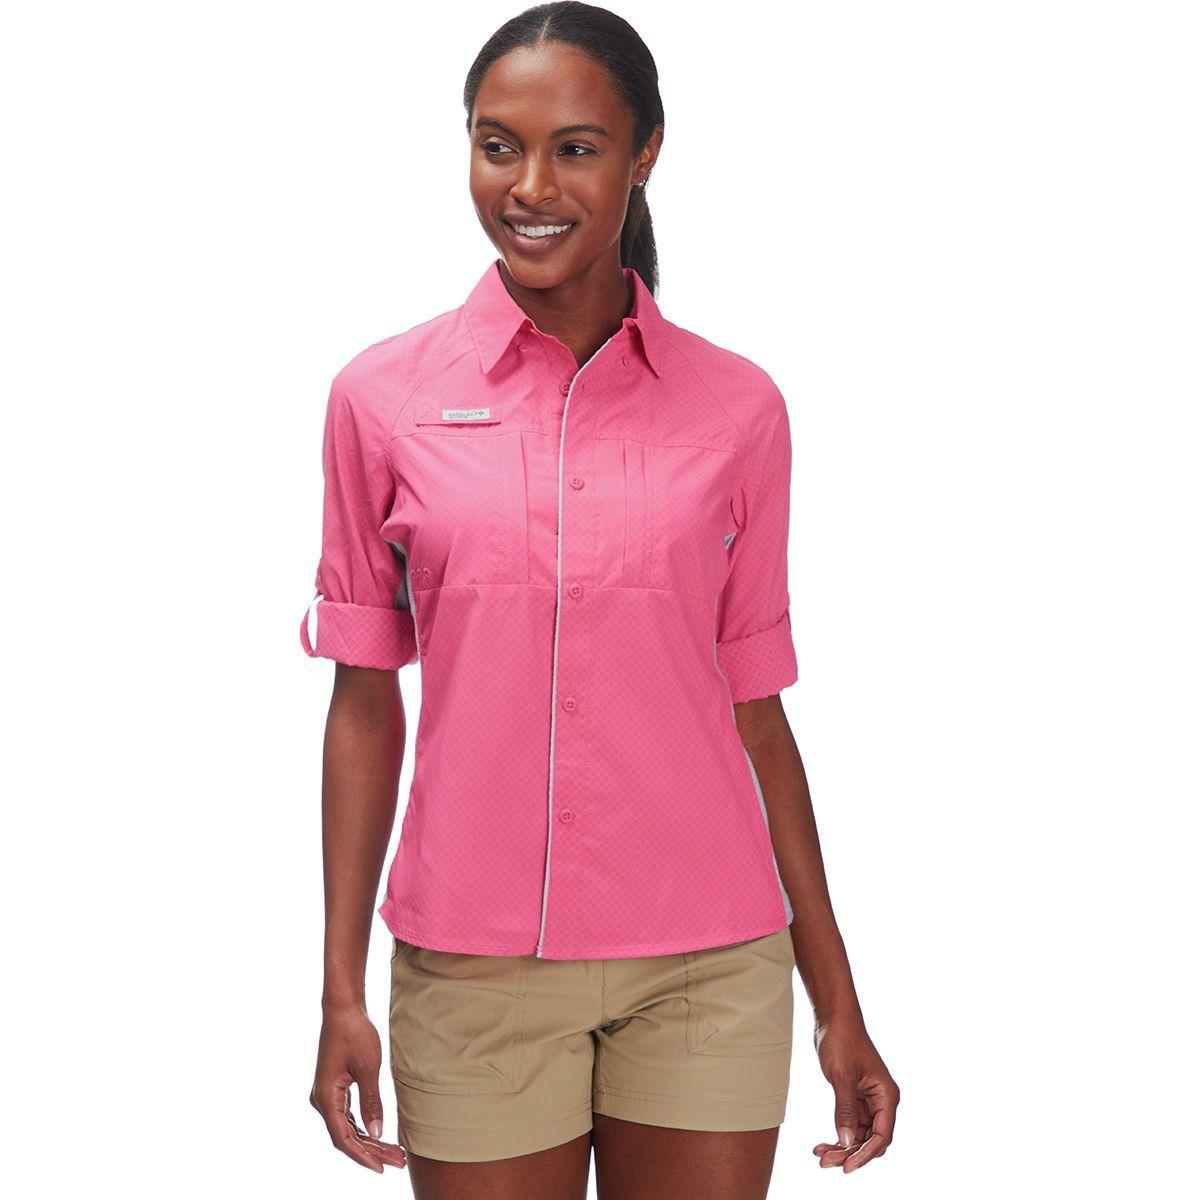 Columbia Ultimate Catch Zero II Long-Sleeve Shirt - Women's